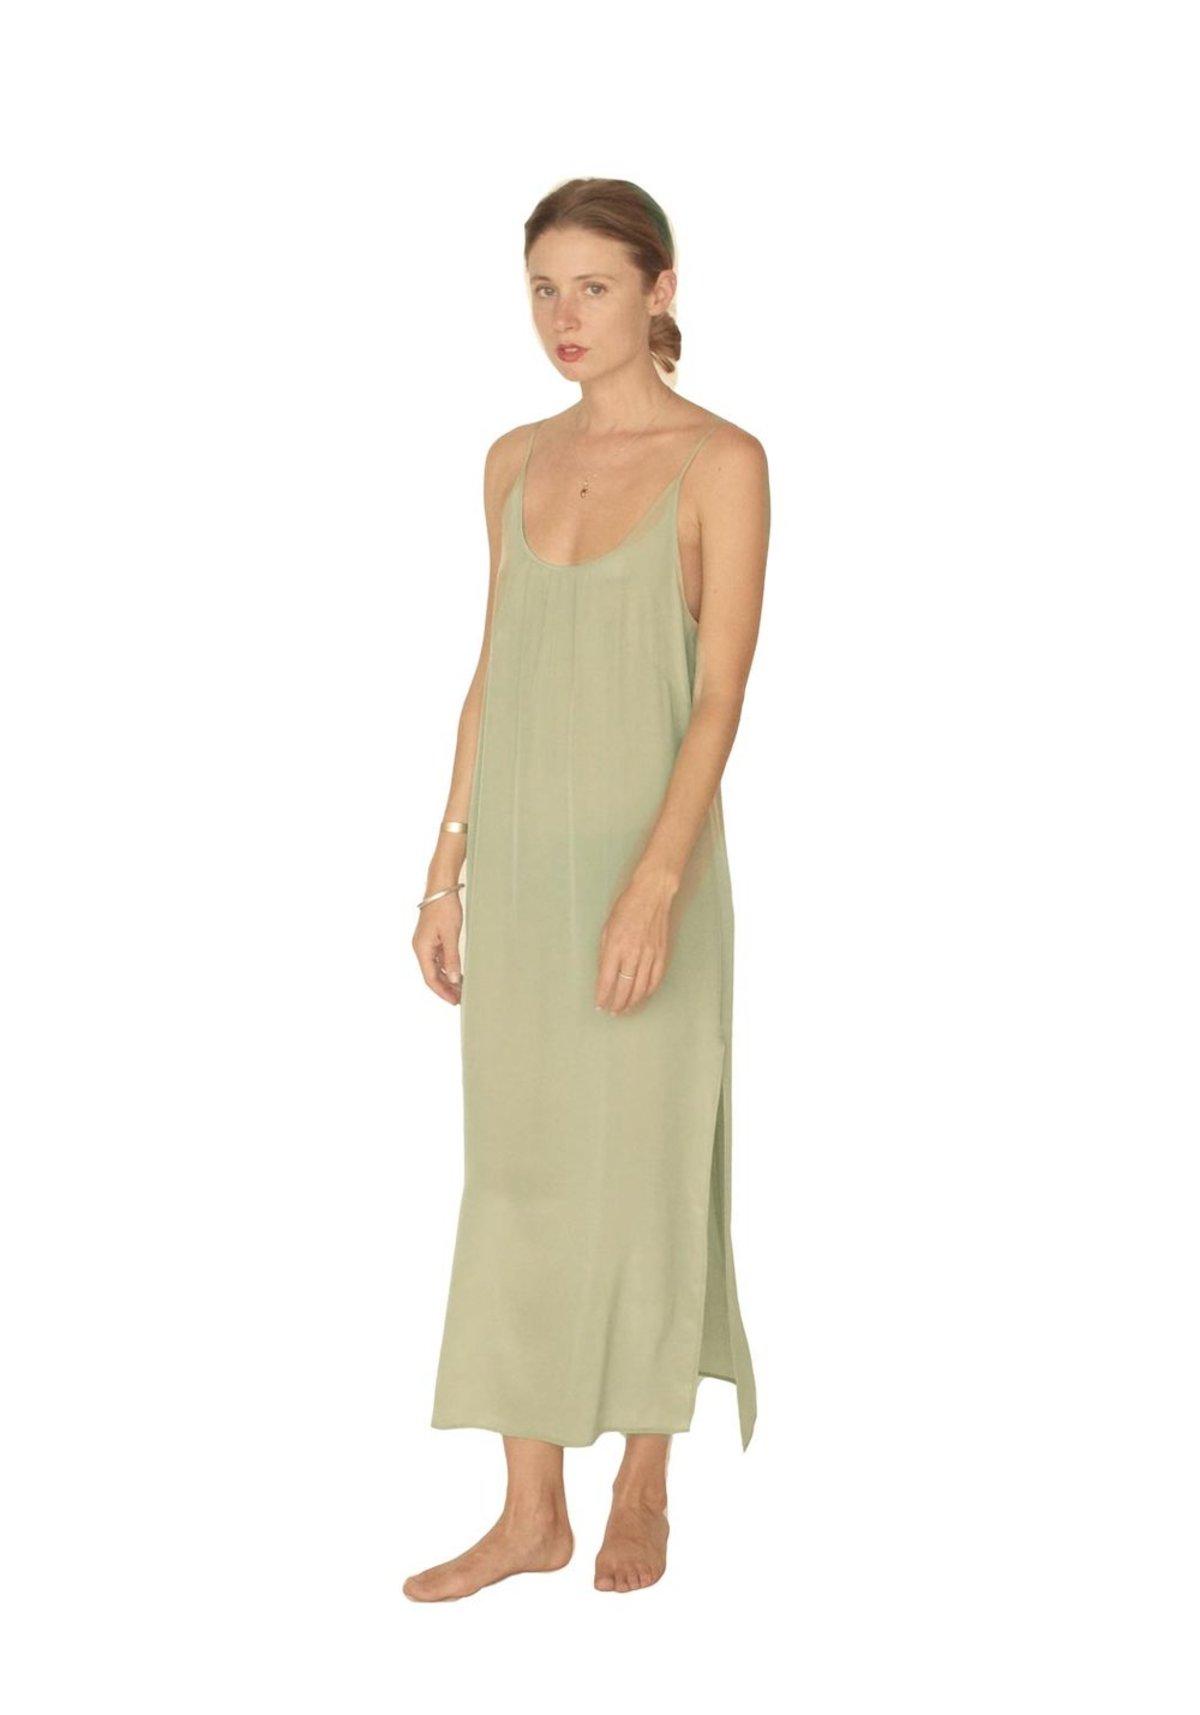 Strathcona Light Moss Green Silk Slip Dress   Garmentory